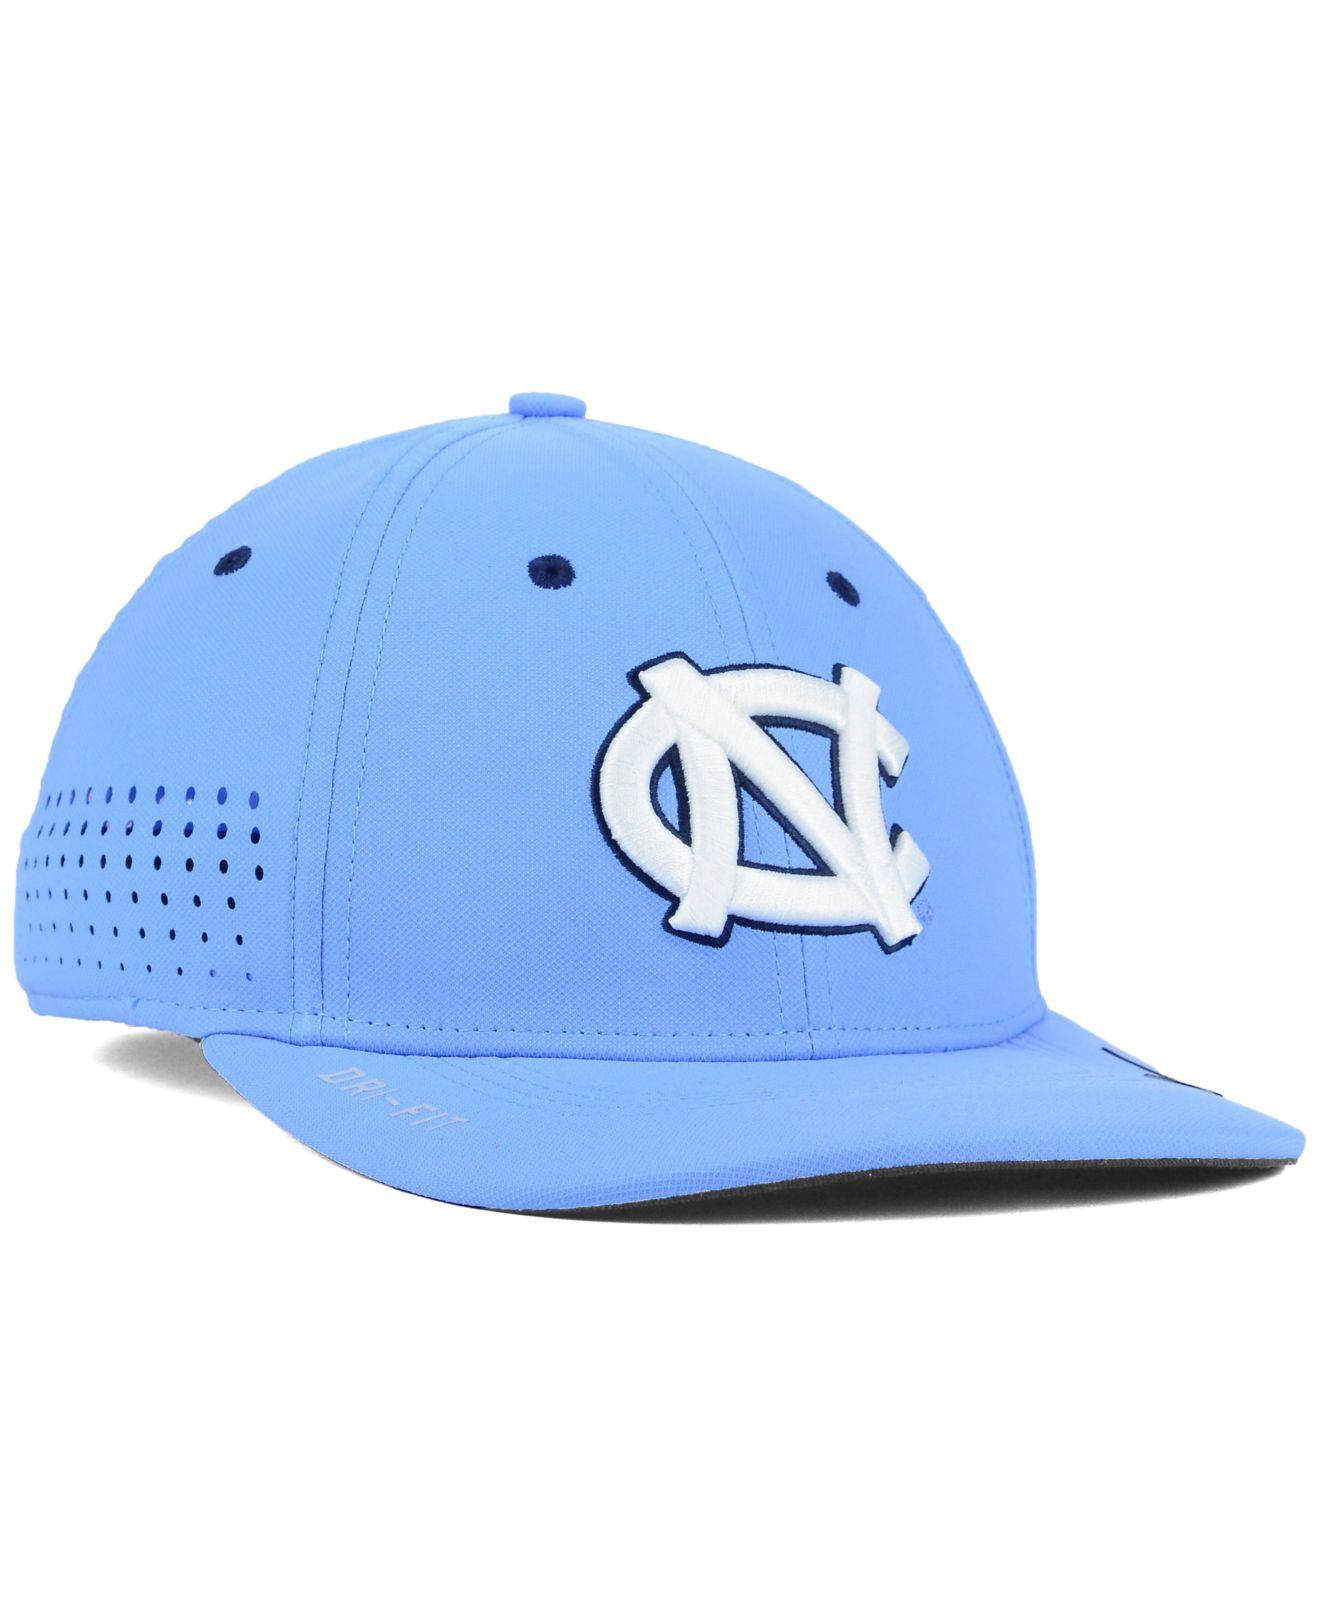 sale retailer 7344b 8354b ... reduced lyst nike north carolina tar heels sideline cap in blue for men  17b95 d46ef canada nike heritage86 ...